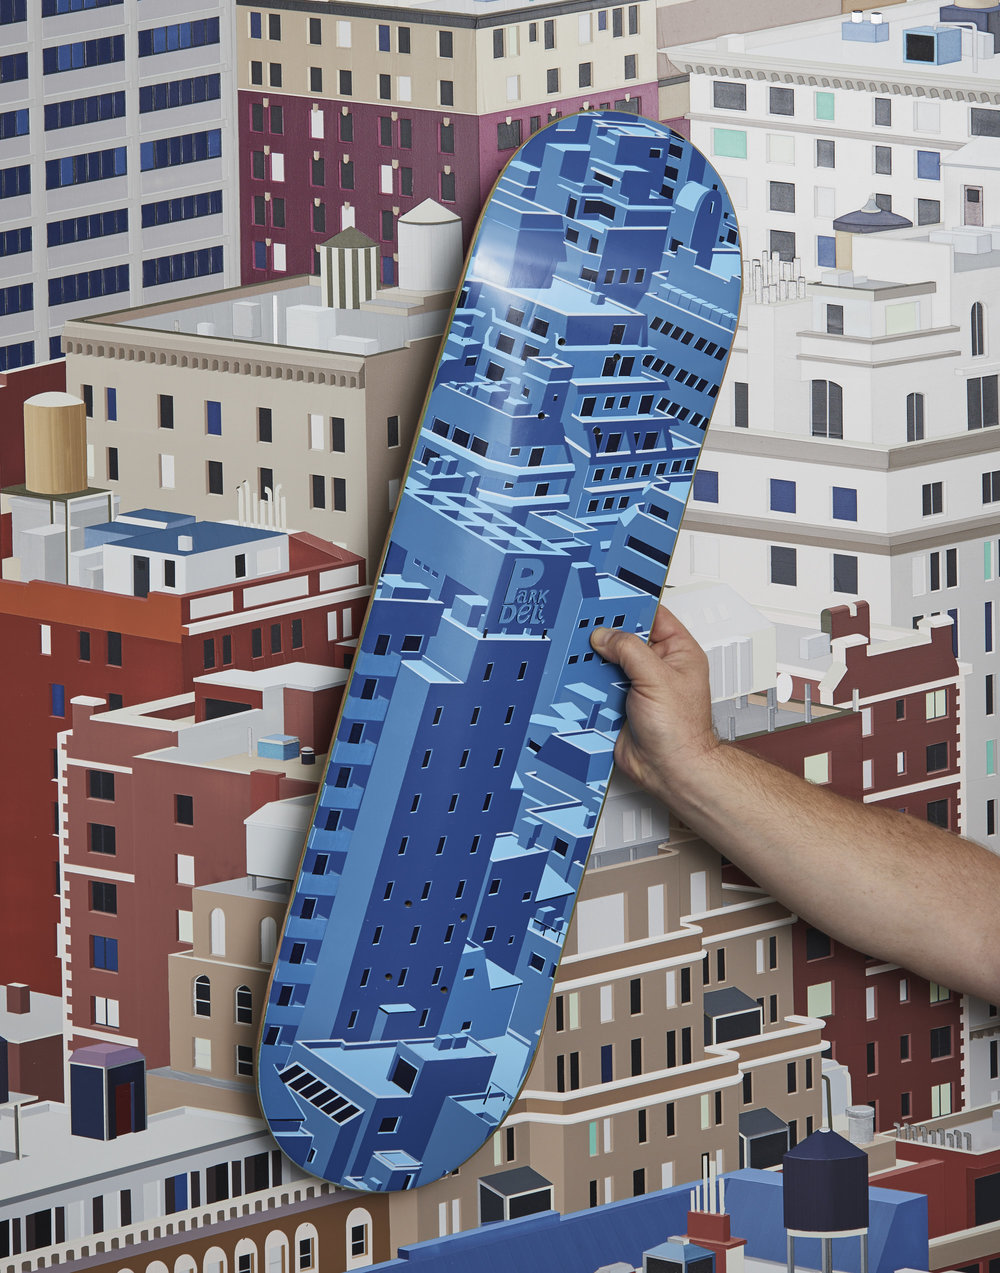 Park Deli Daniel Rich Skateboard Deck